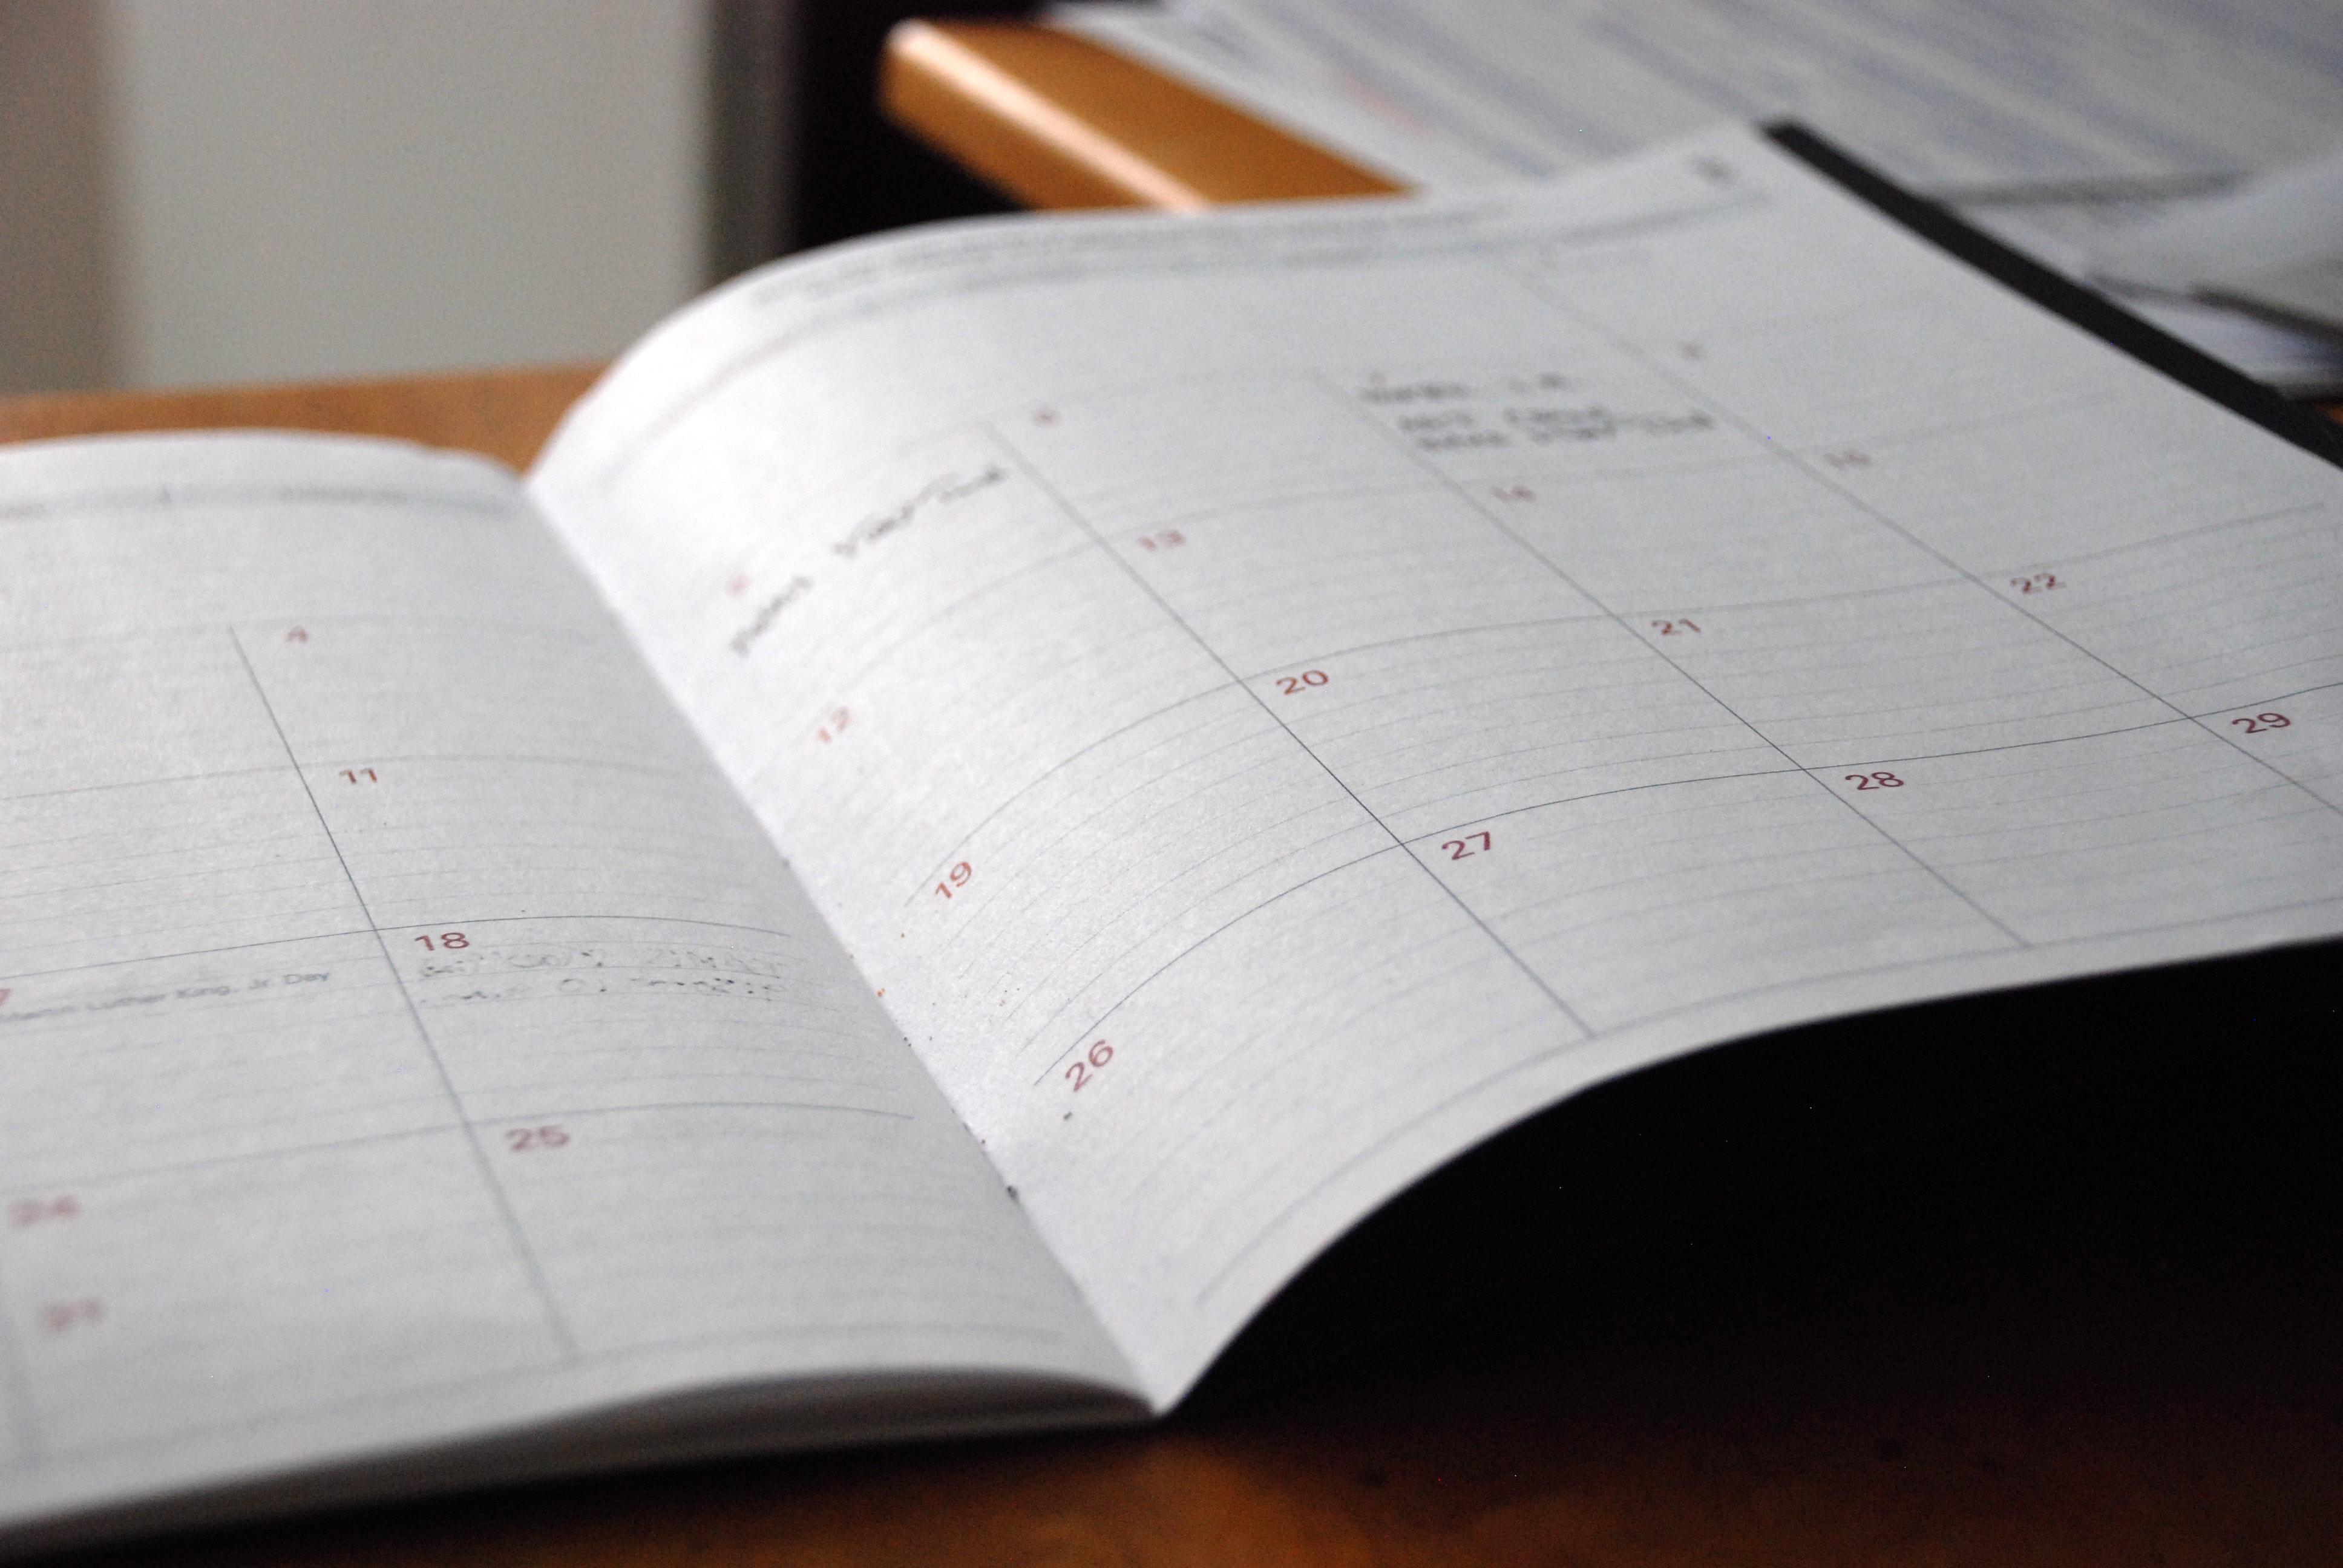 Plan your Best Content Calendar for 2018